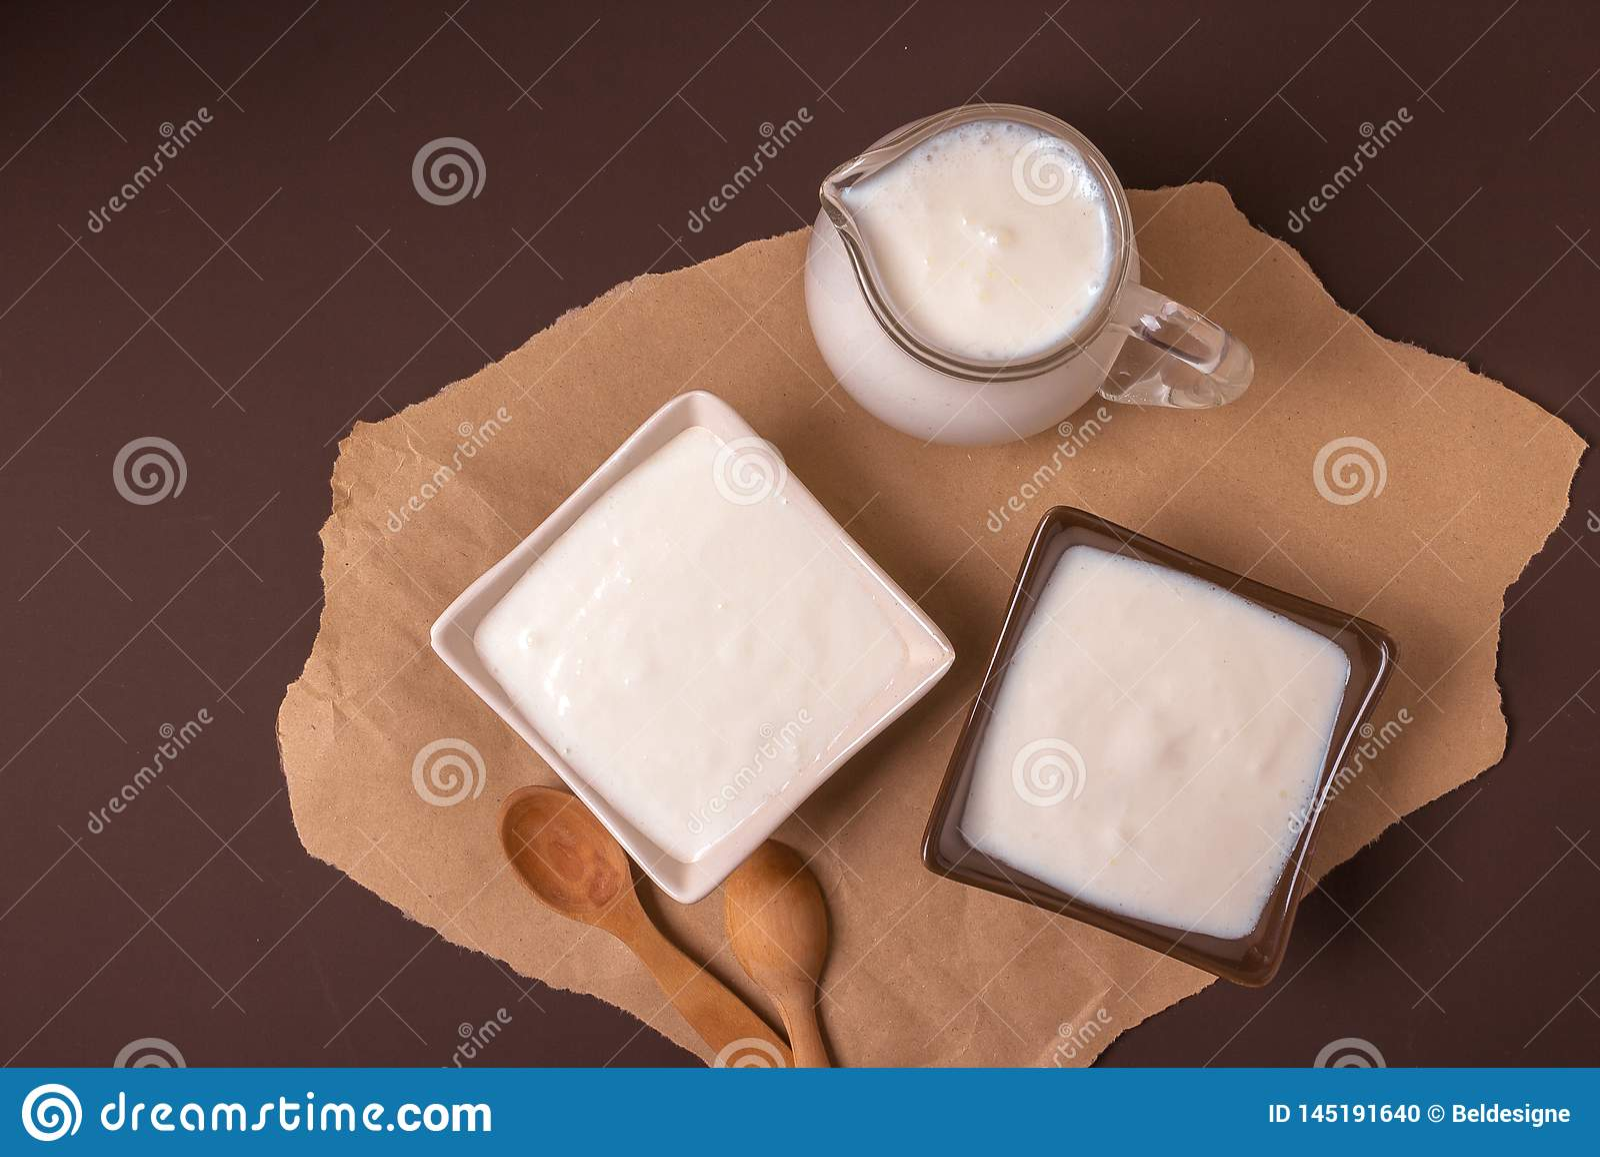 Homemade yogurt in ceramic square bowls, a jug brim full of yogurt behind the bowls. Healthy food from yogurt concept. Top view